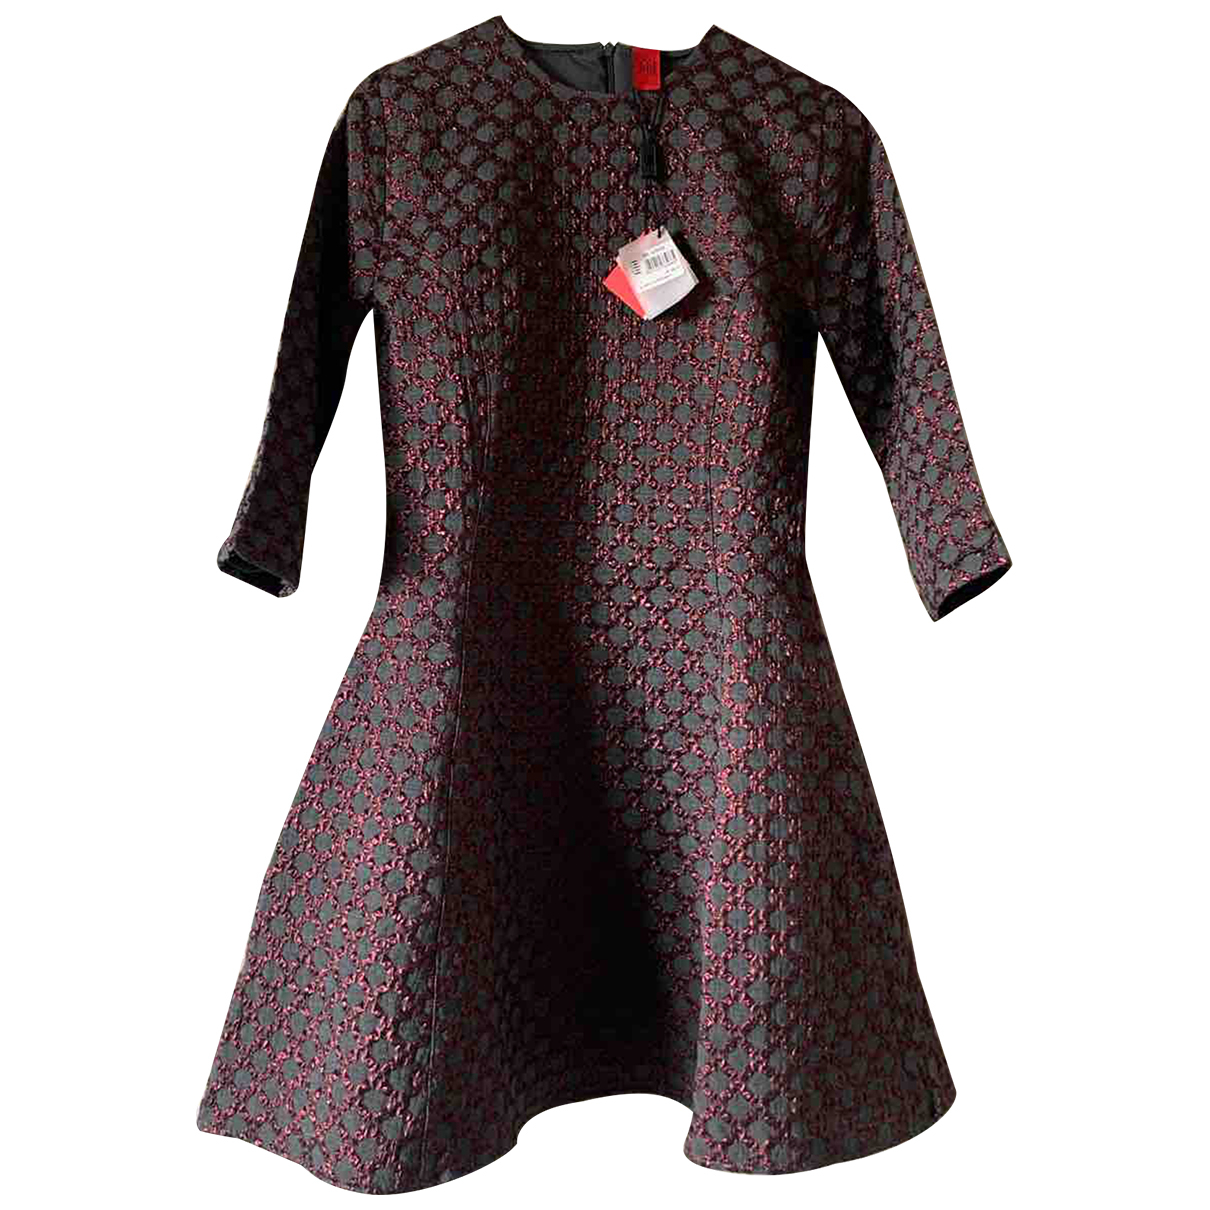 Jijil \N Kleid in  Anthrazit Polyester